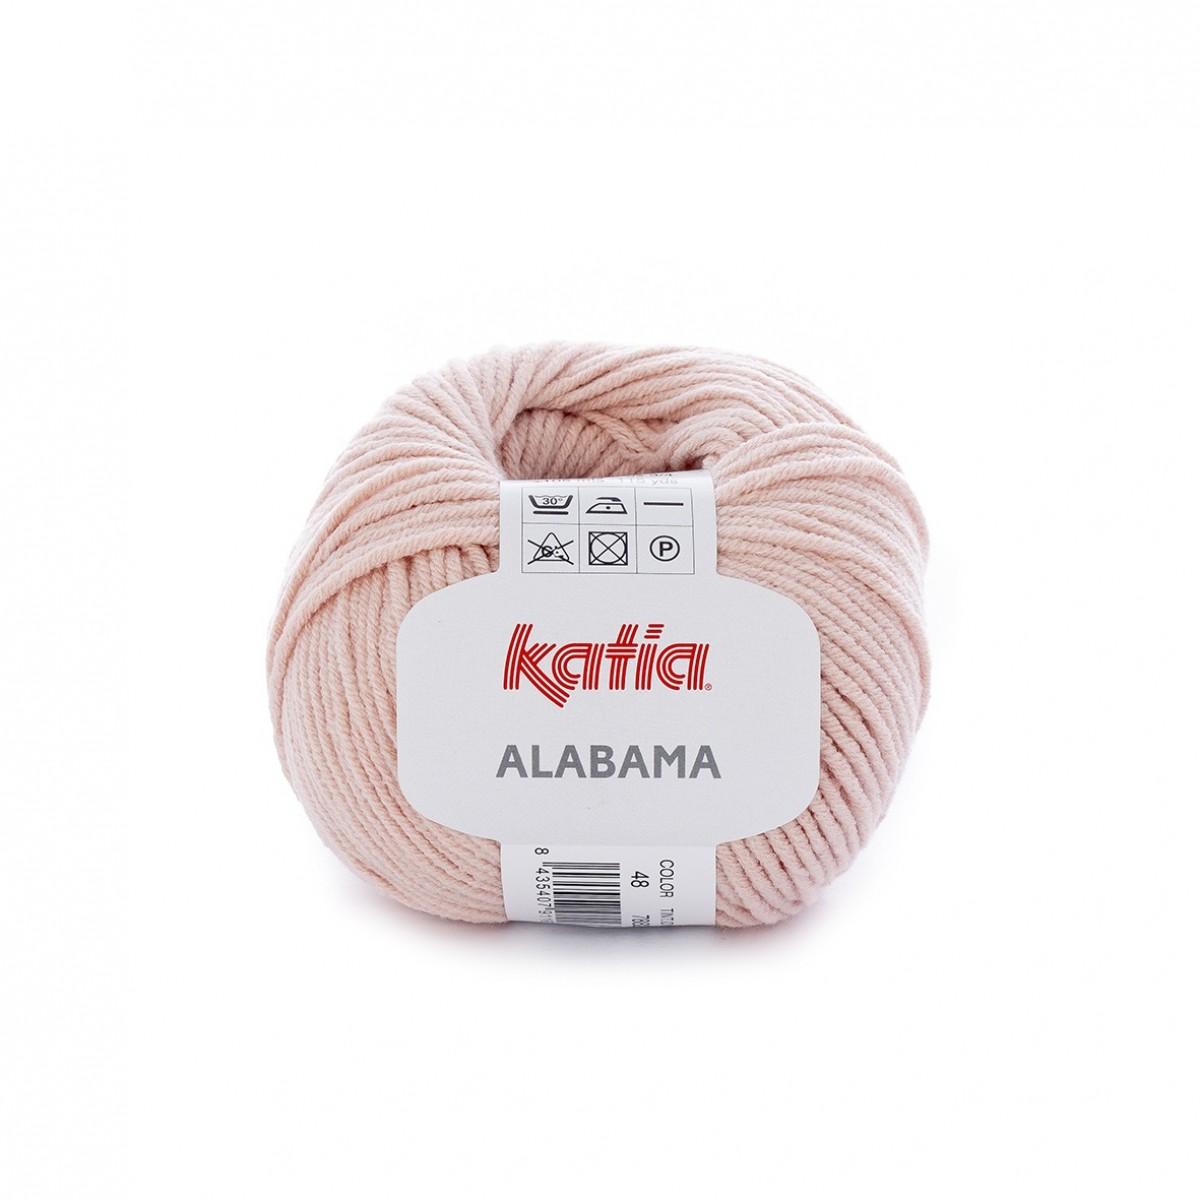 ALABAMA von Katia ROJO 32 - 50 g // ca 105 m Wolle